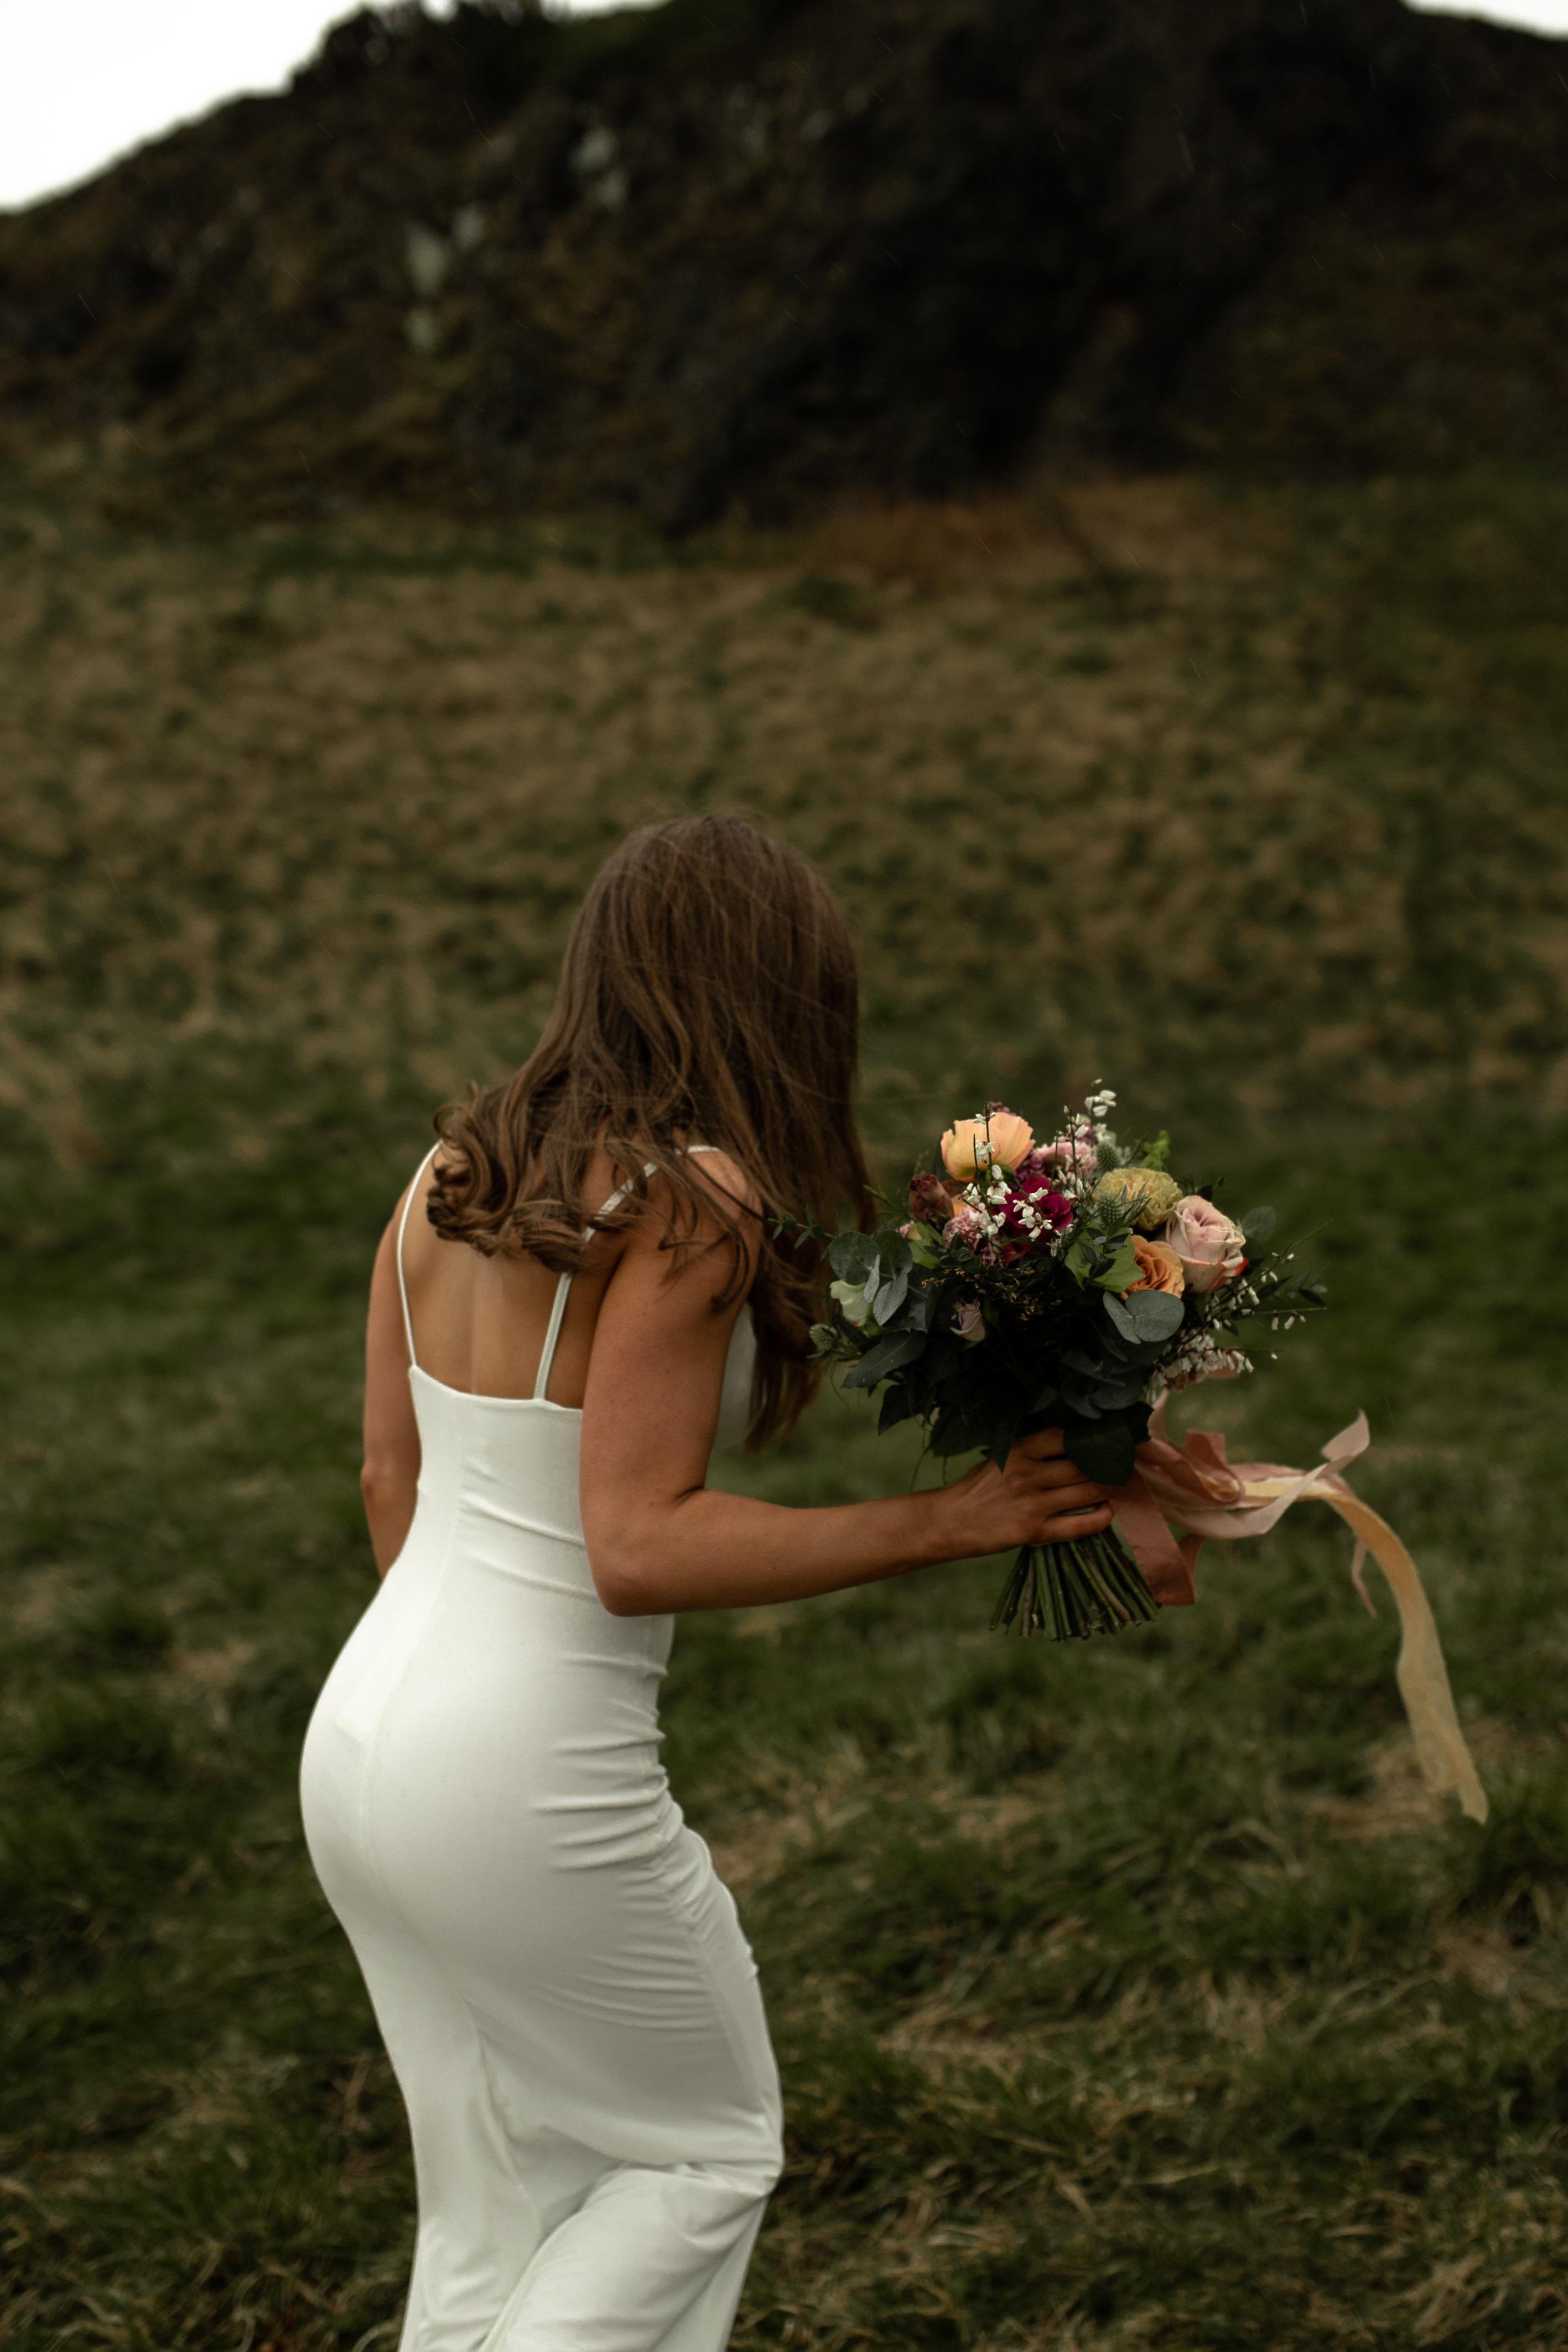 Paula_Russell_Photography_Edinburgh_Wedding_BBonnie_Flowers